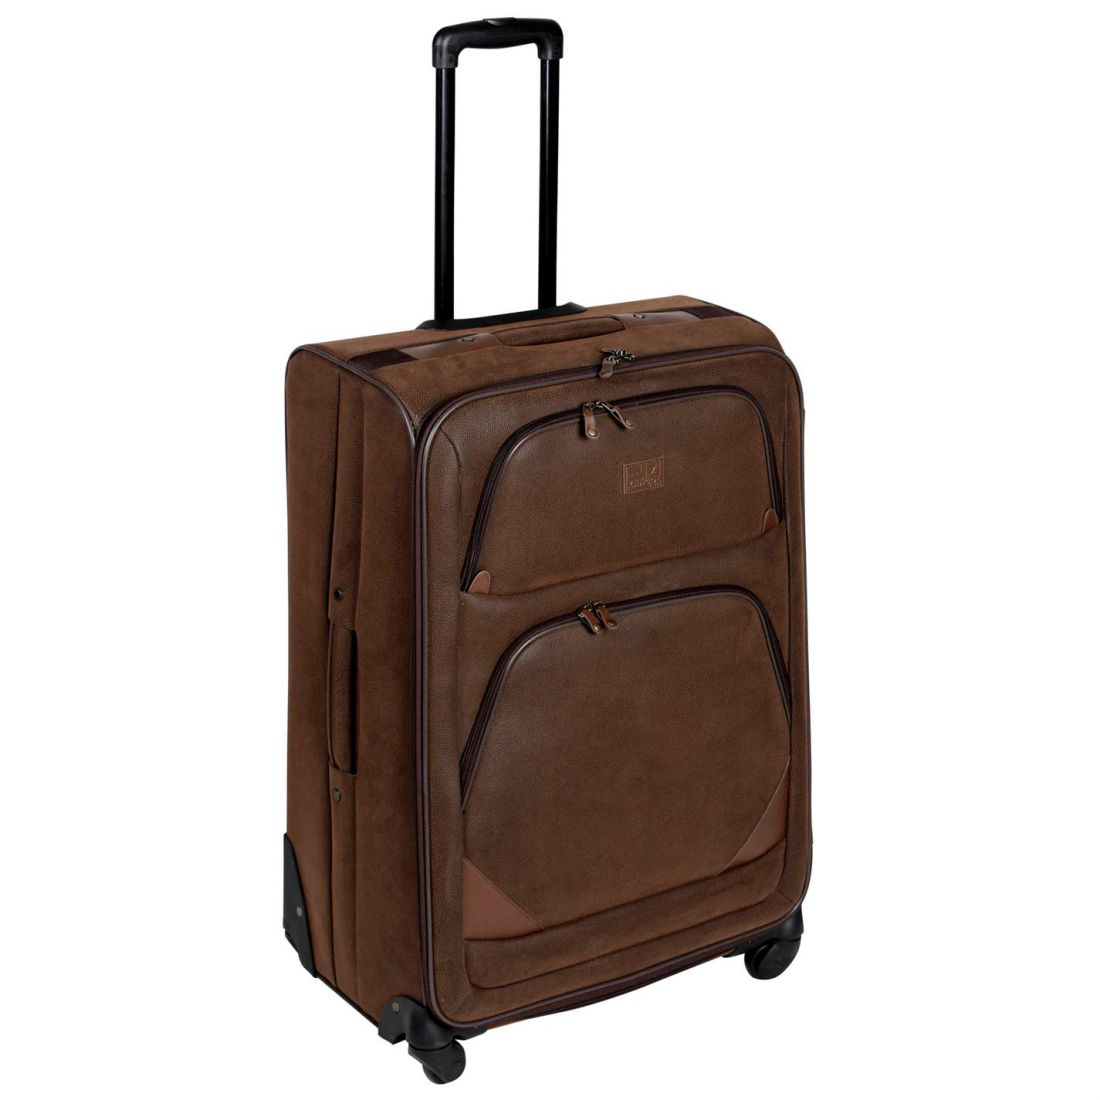 Kangol 4 Wheel Suitcase Extending Handle Luggage Travel Accessories ... e14f99b1c6